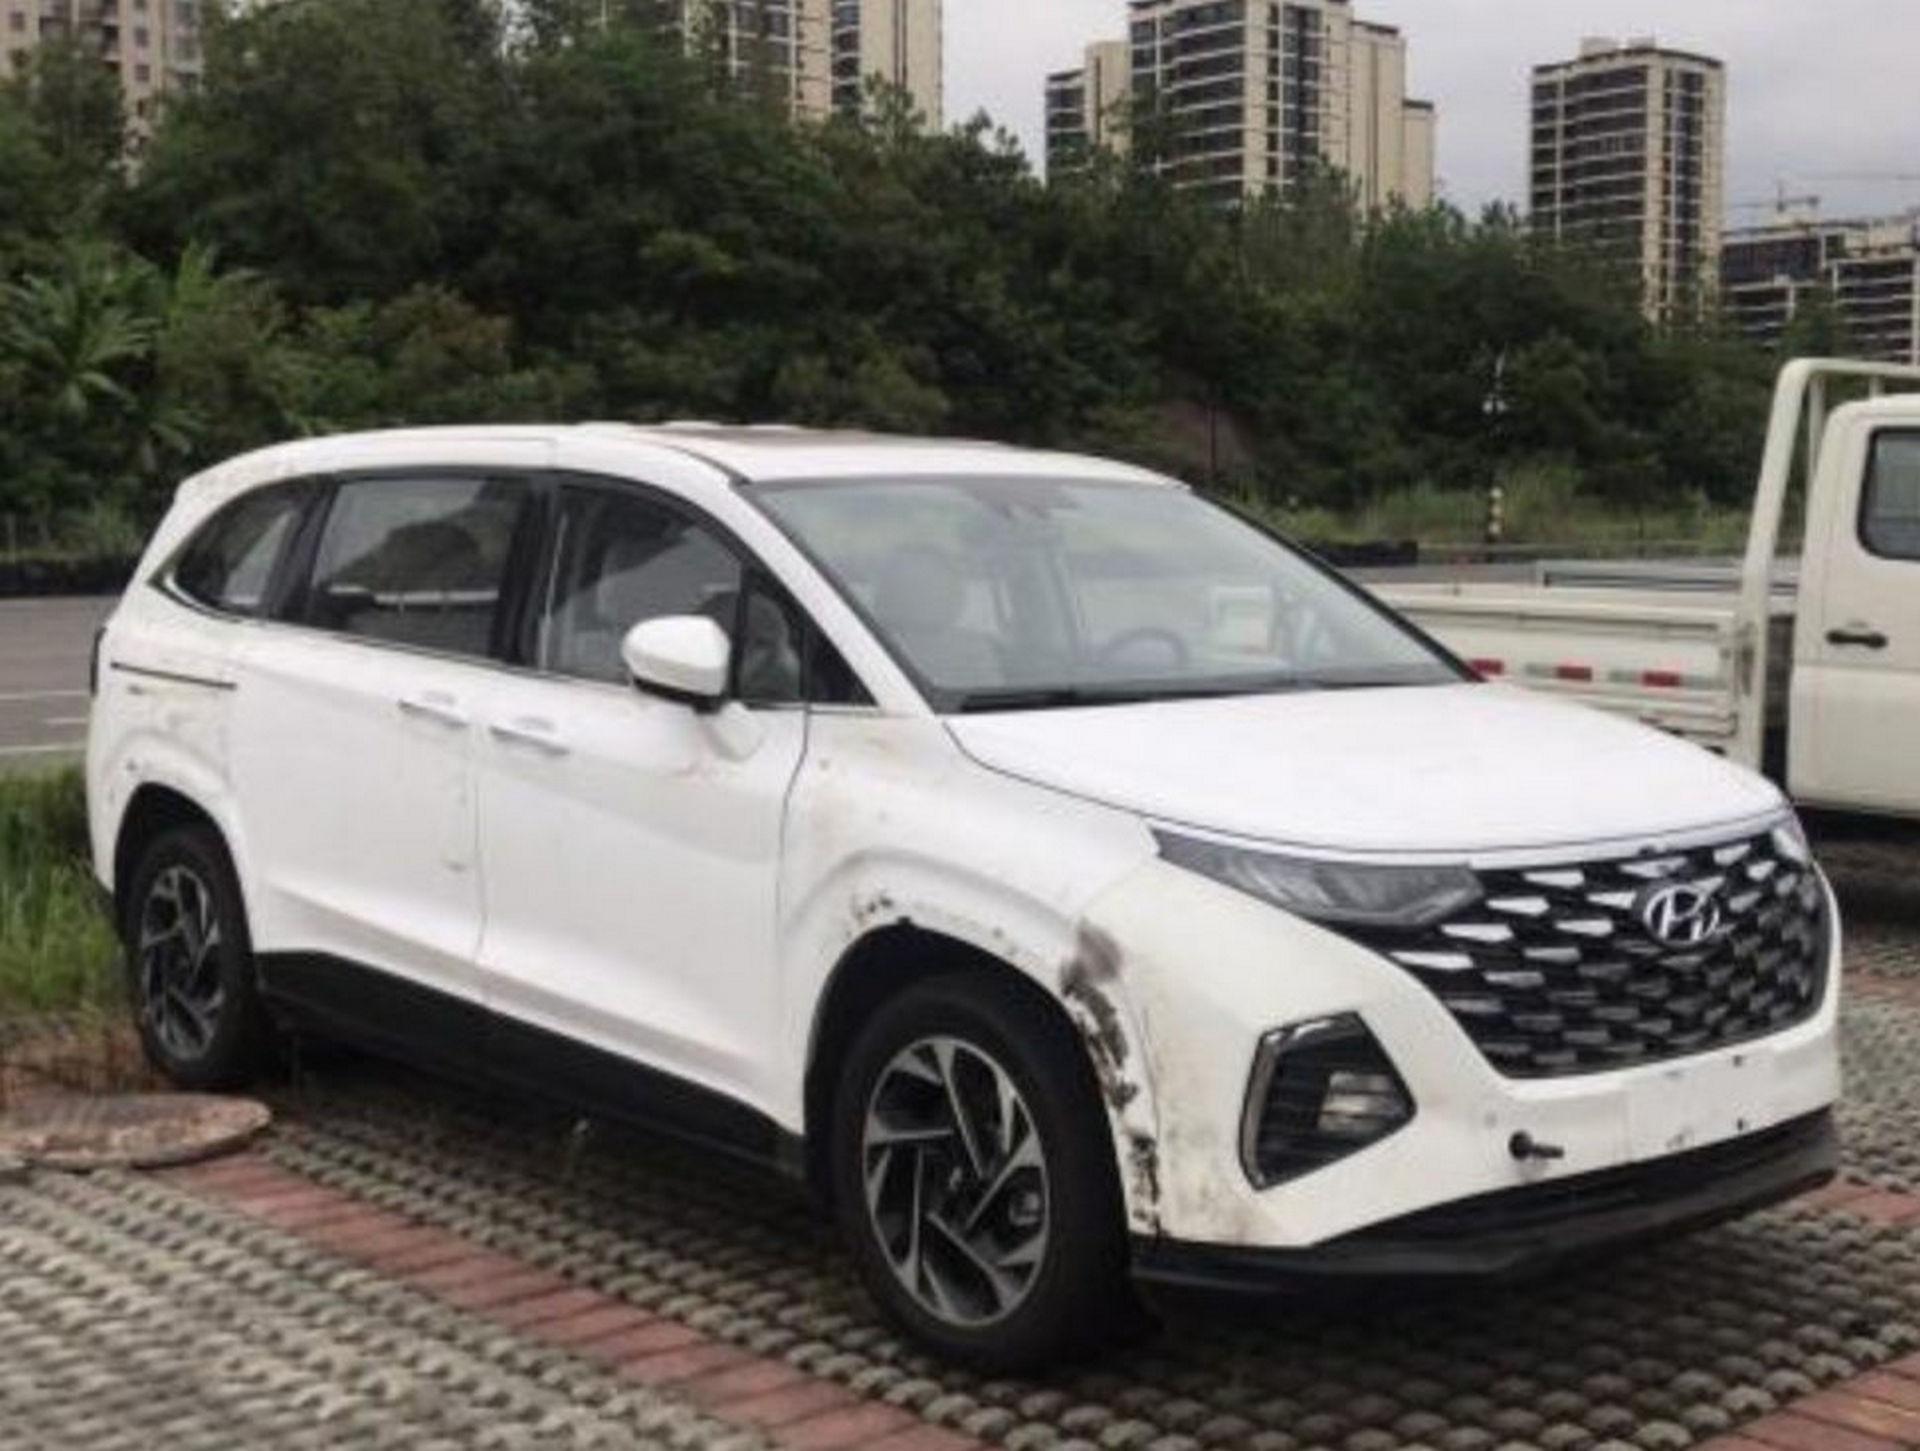 Hyundai_Custo_leaked_0000